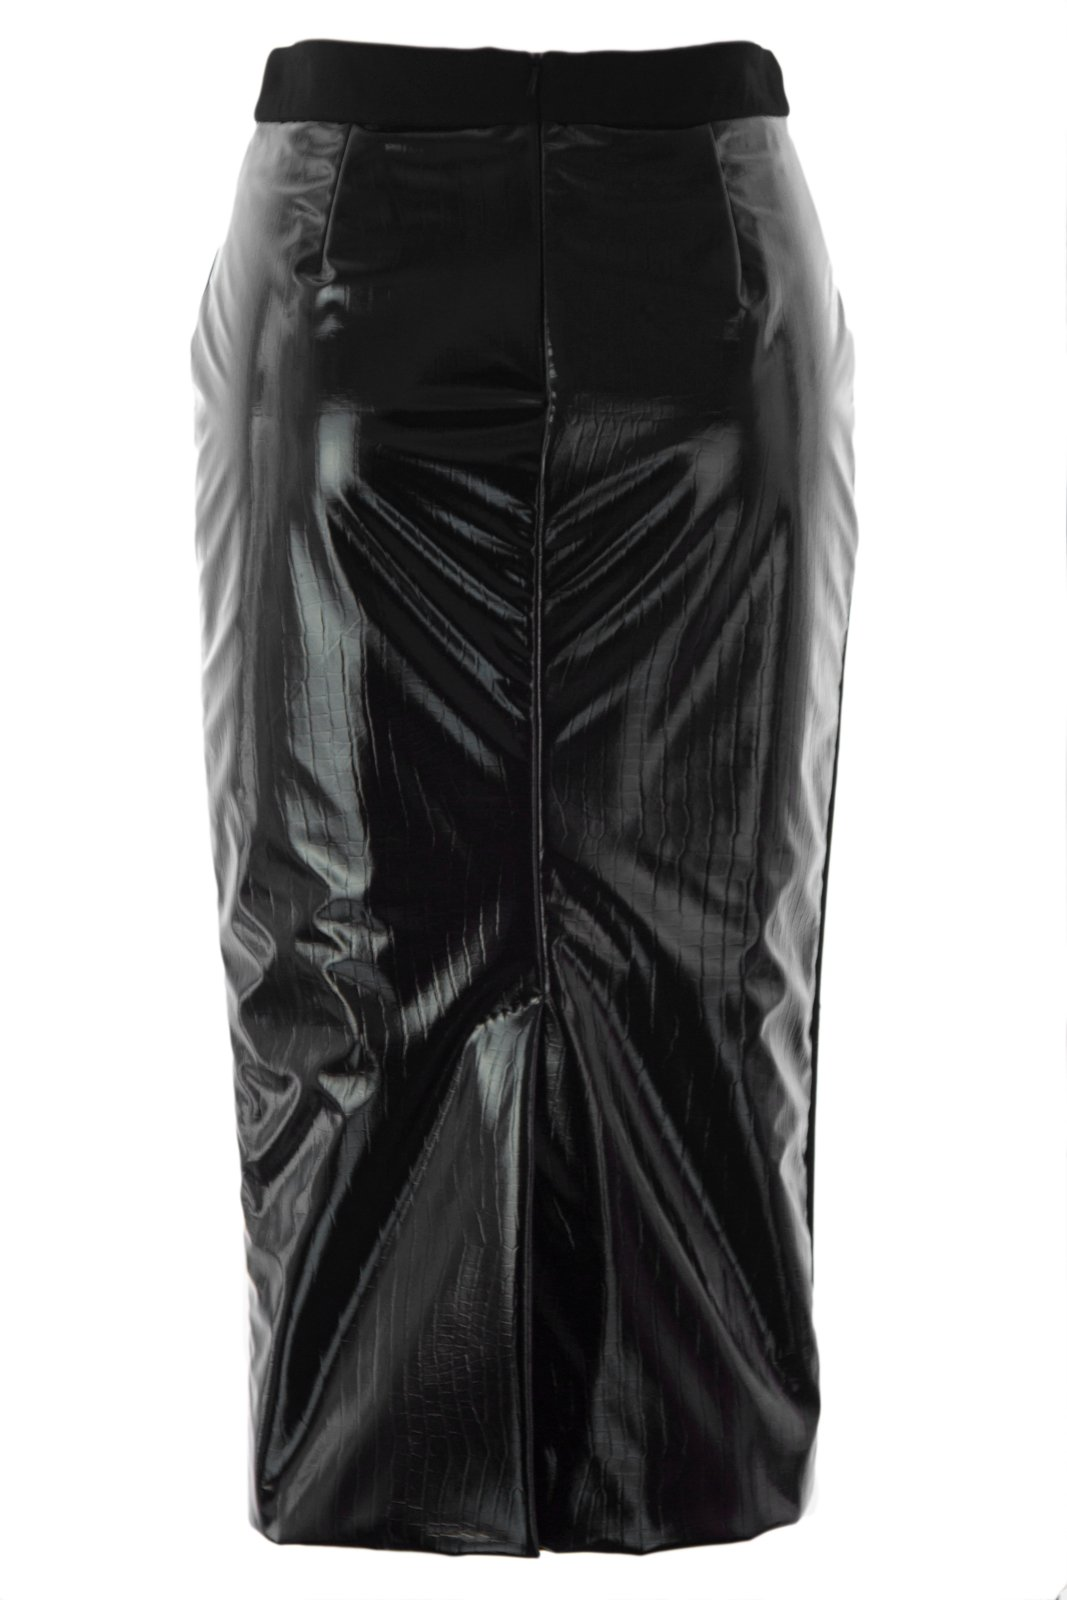 Max Mara Women's Facile Backside Croc Embossed Skirt Sz 4 Black by MaxMara (Image #2)